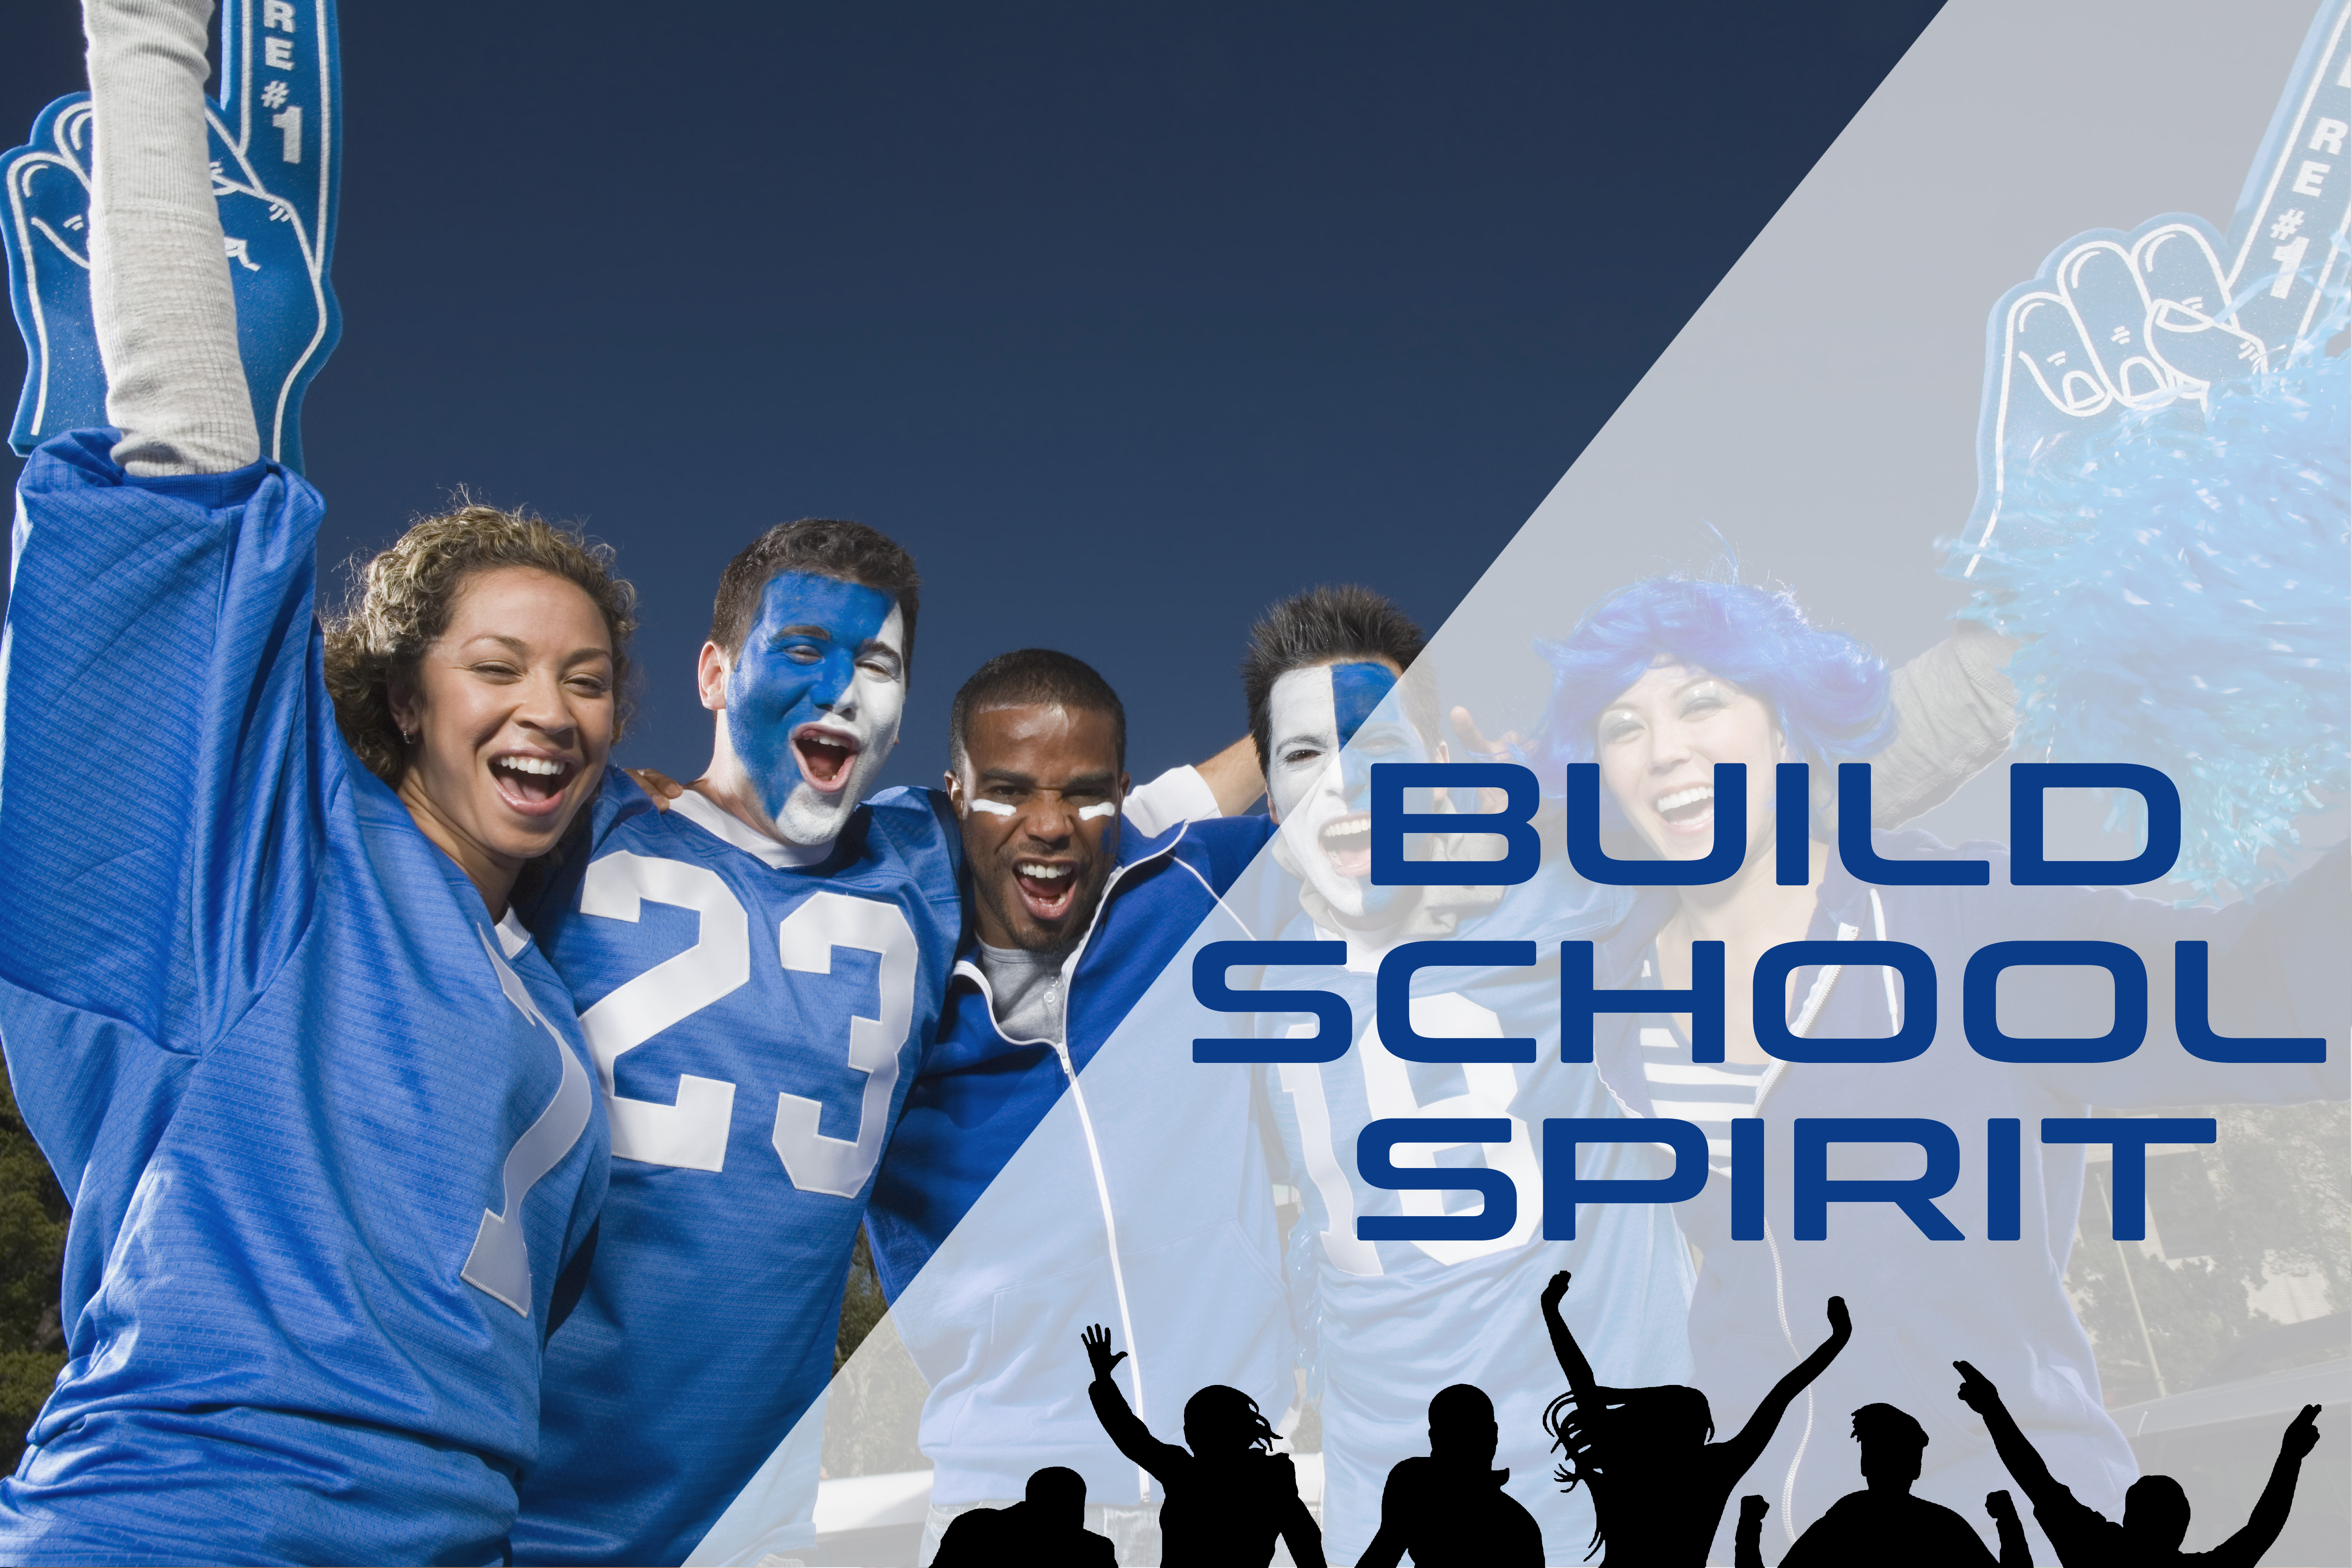 BUILD SCHOOL SPIRIT.jpg